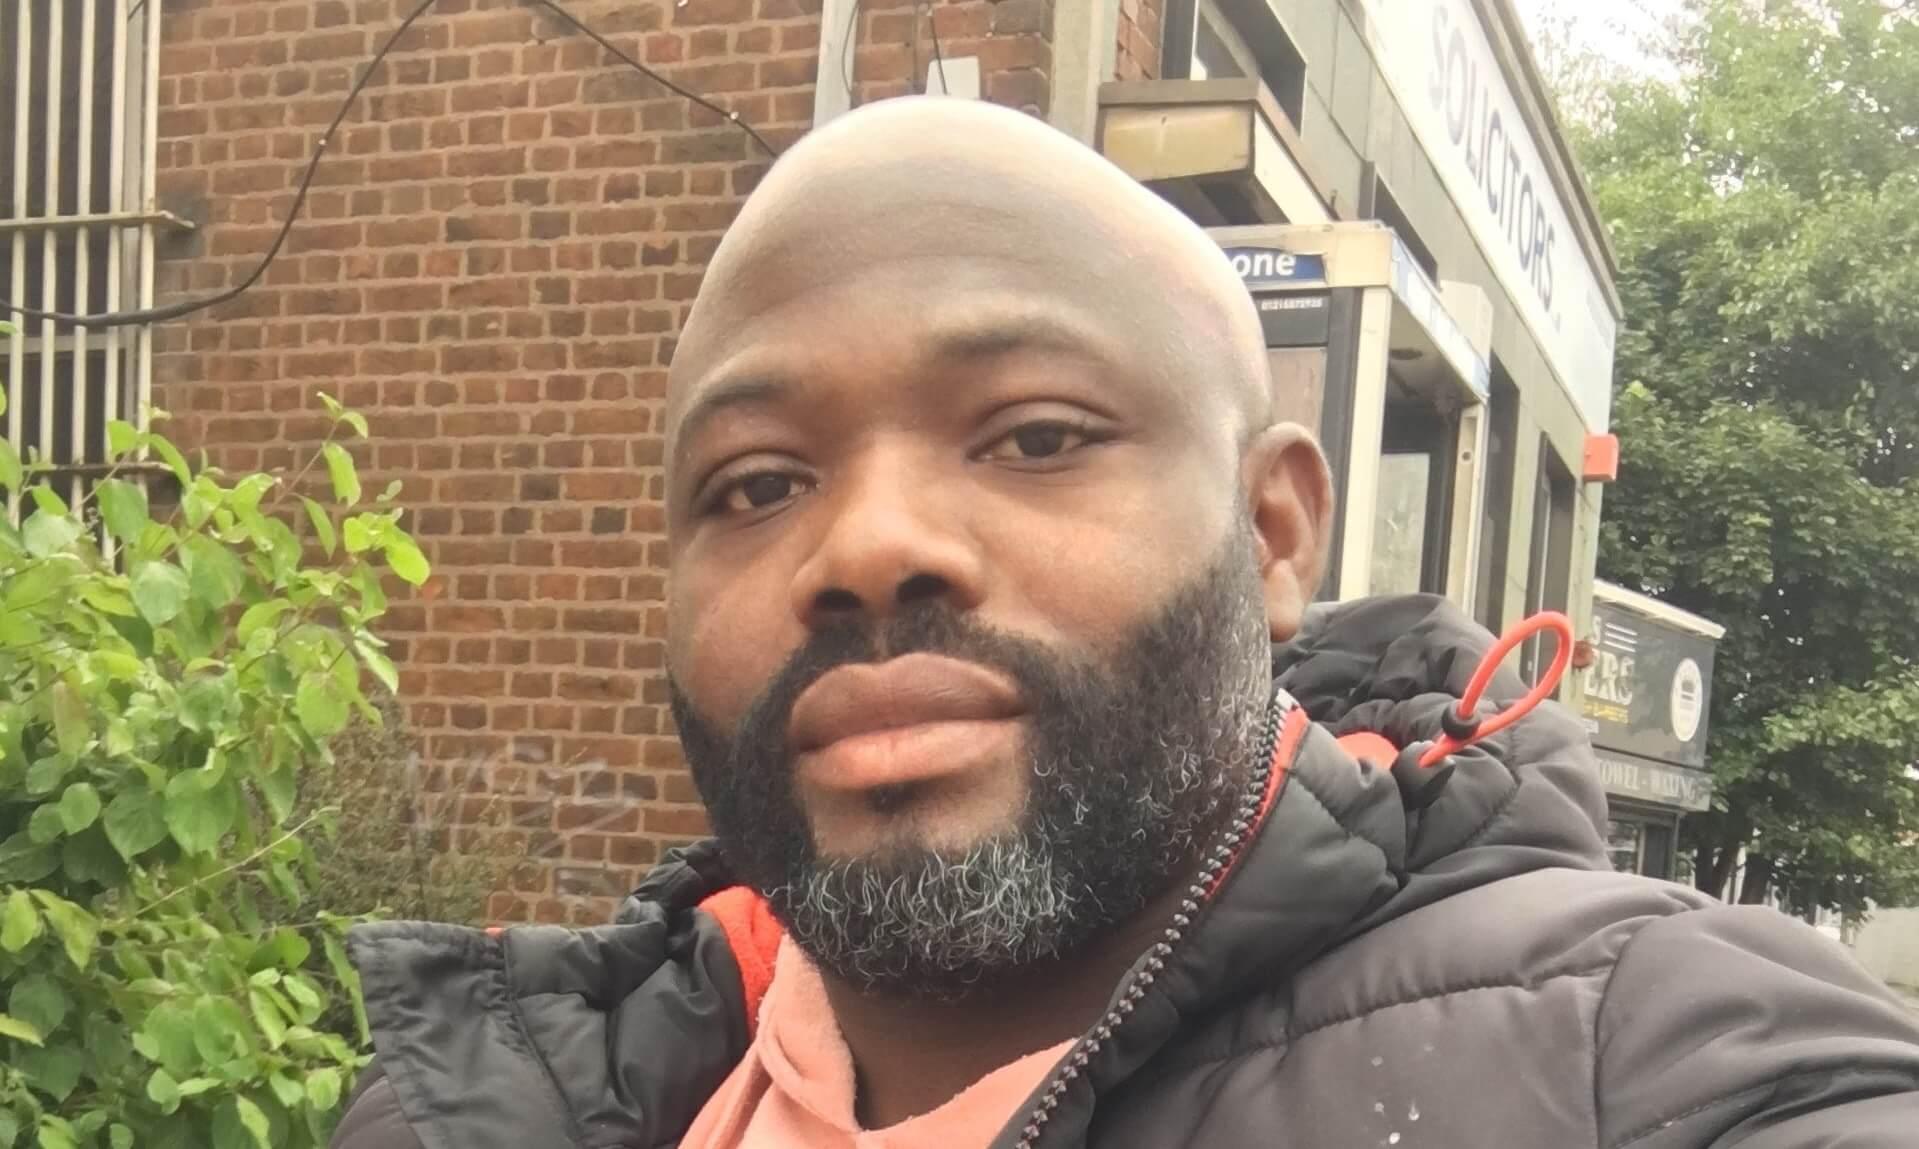 asylum seeker in the UK